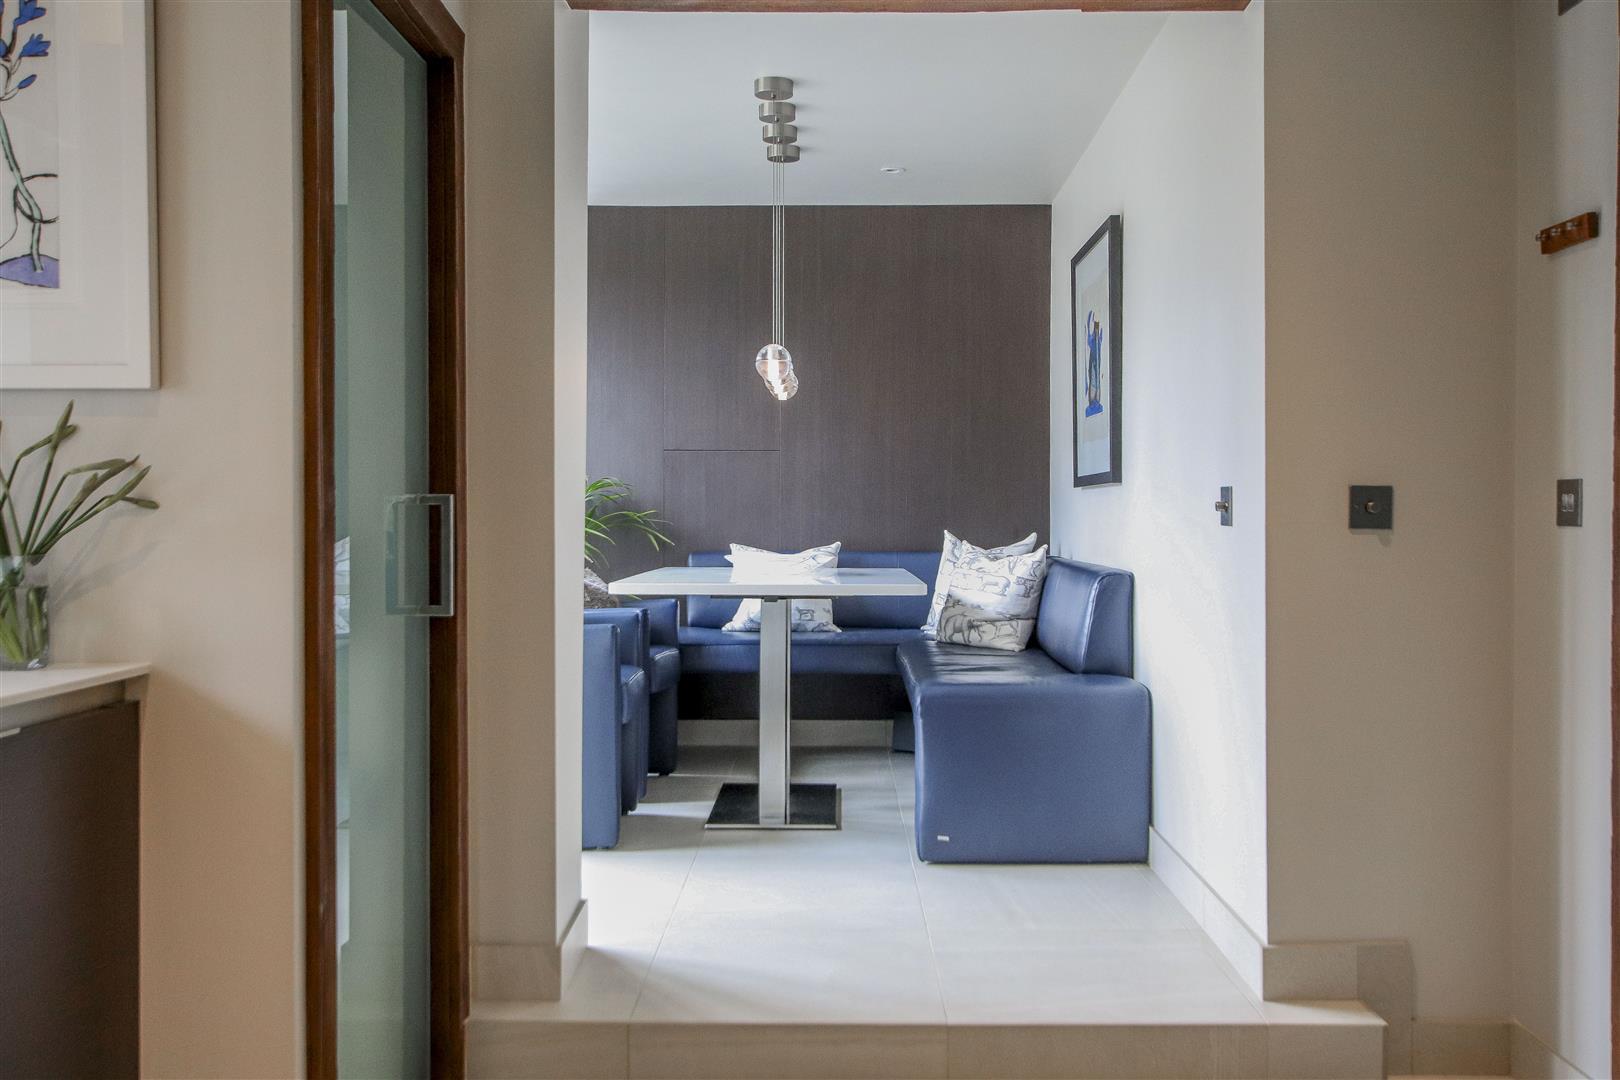 5 Bedroom Semi-detached House For Sale - 7.JPG